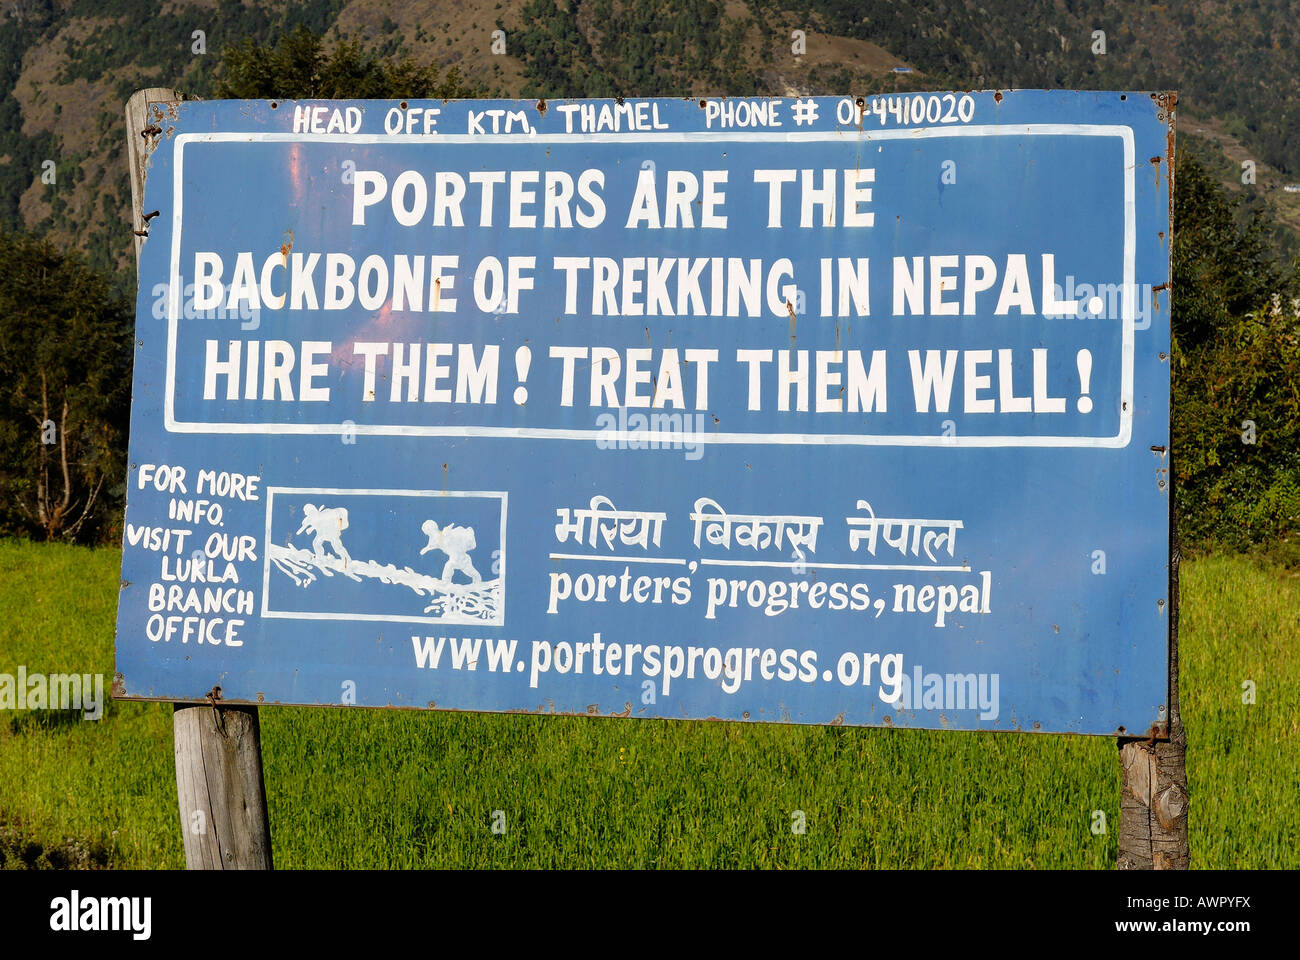 Help project for Sherpa porters, Khumbu Himal, Nepal - Stock Image